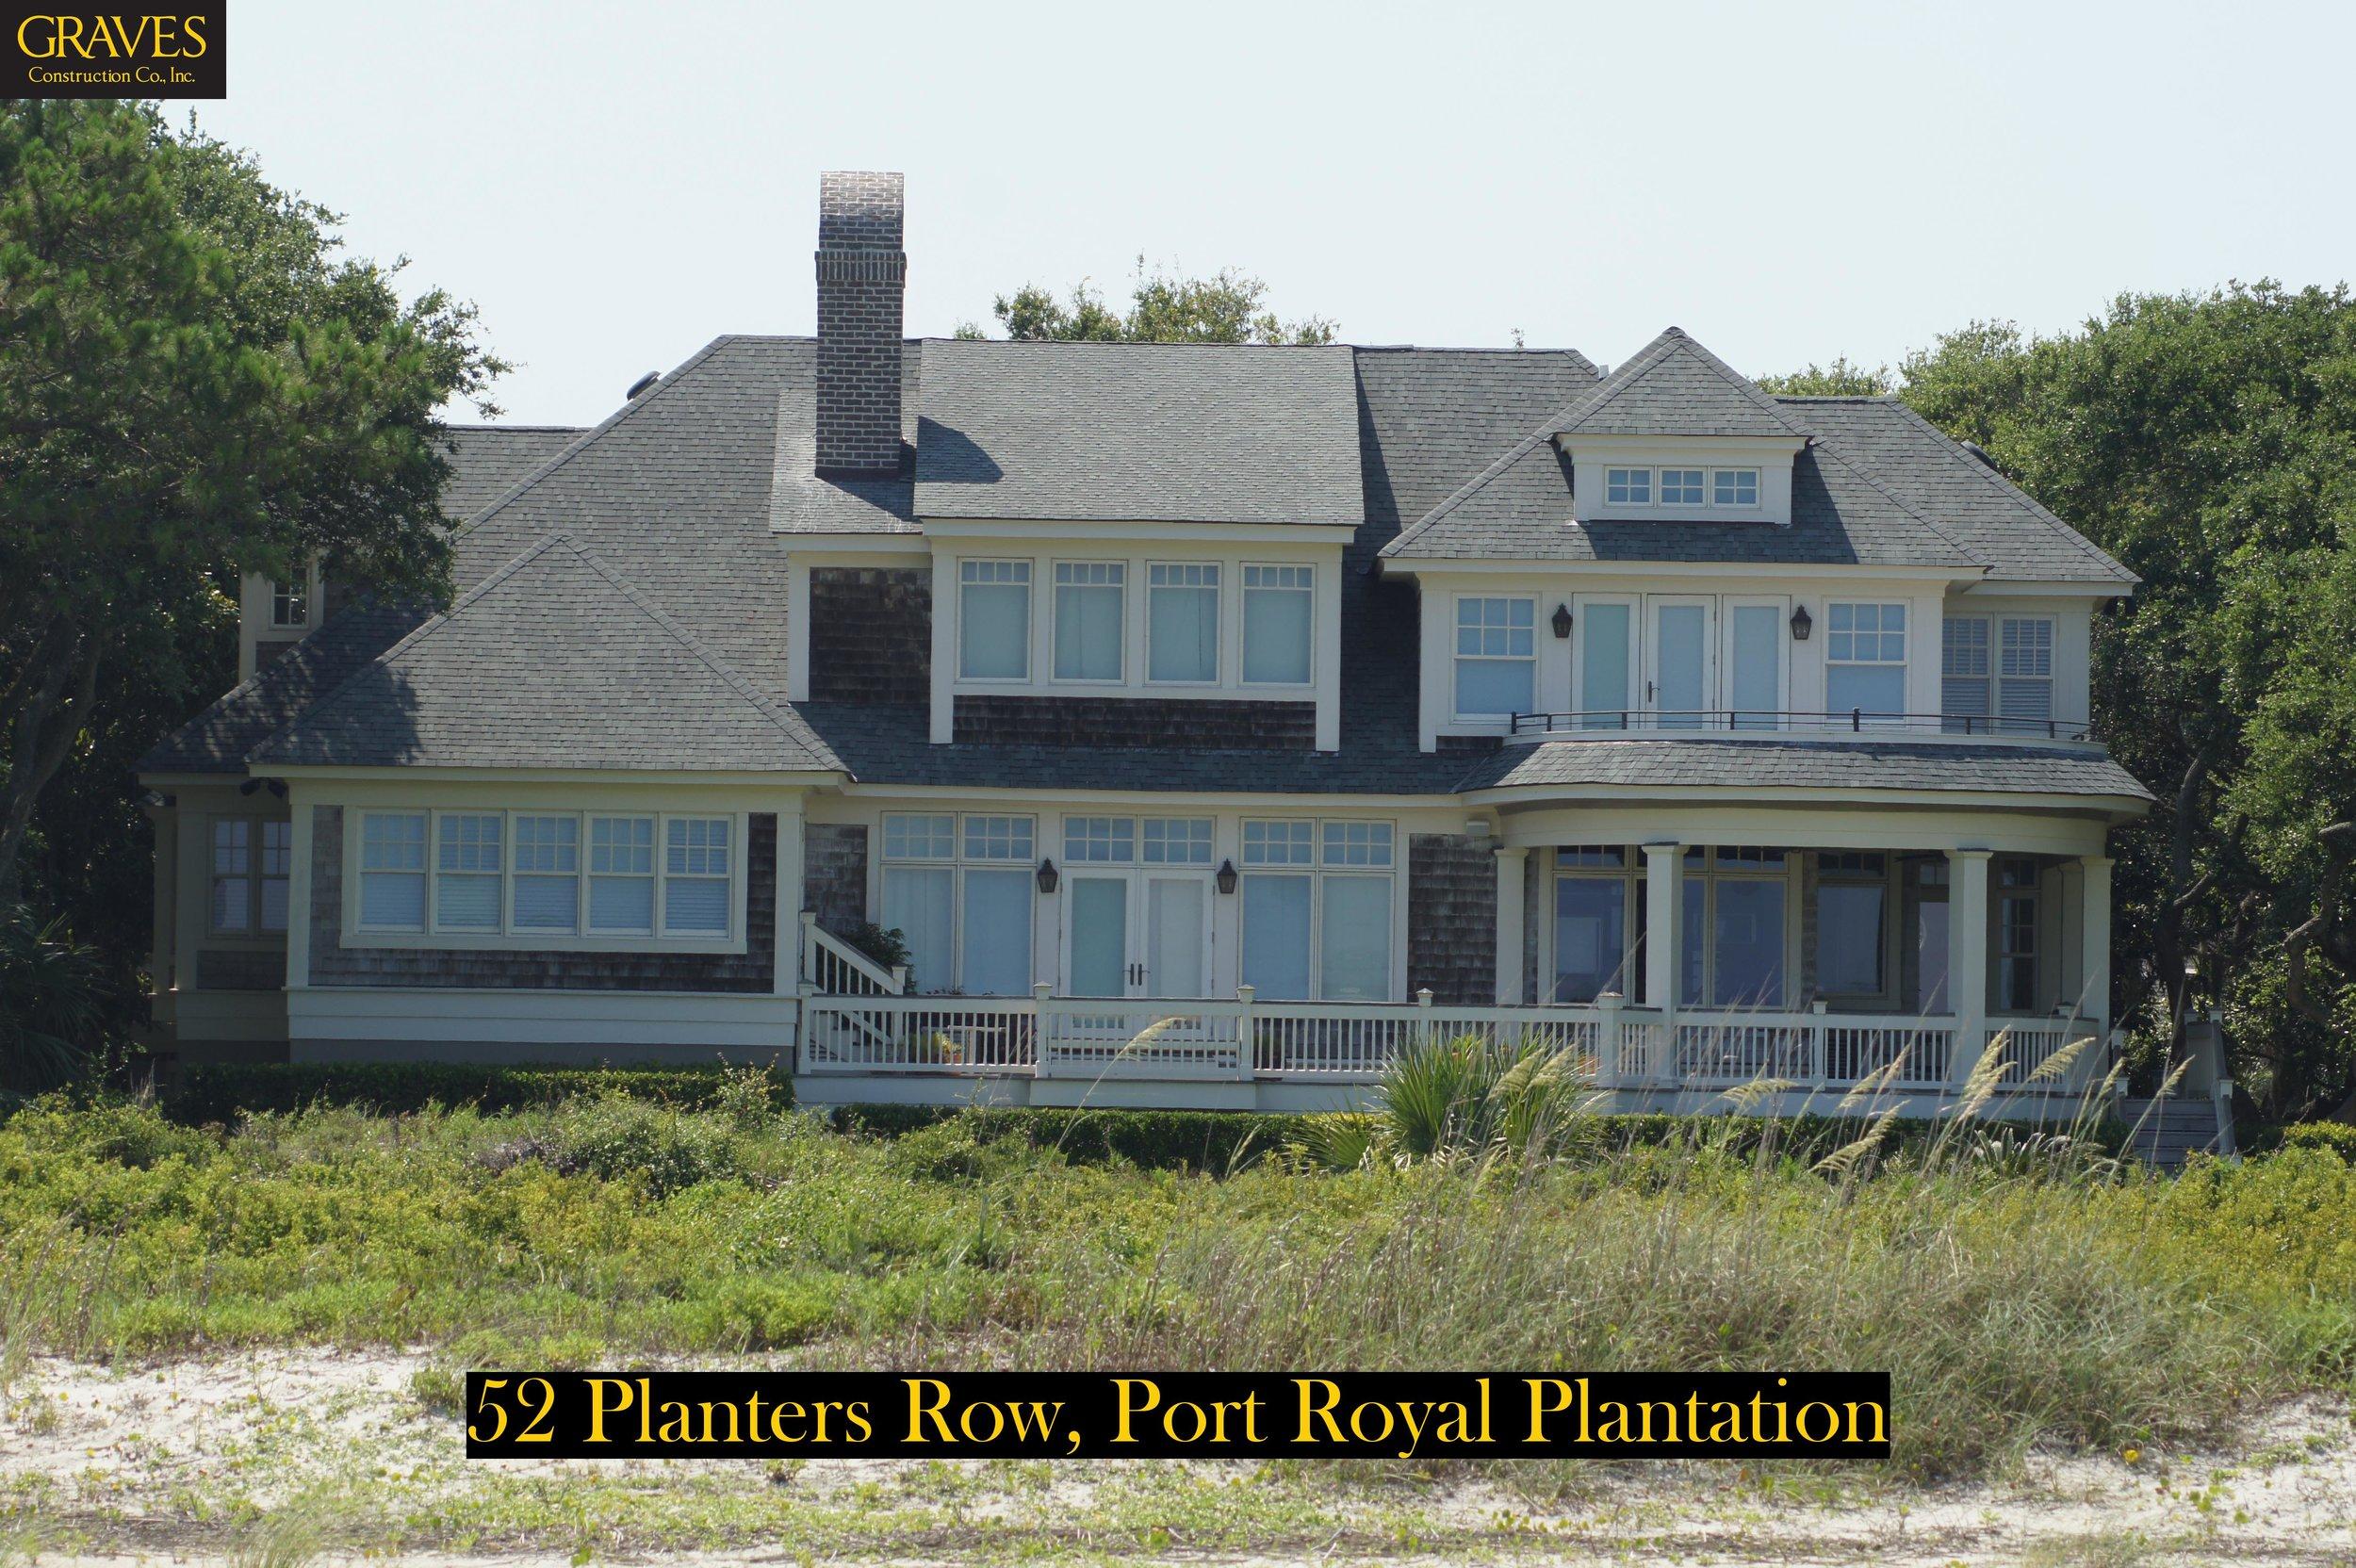 52 Planters Row - 7